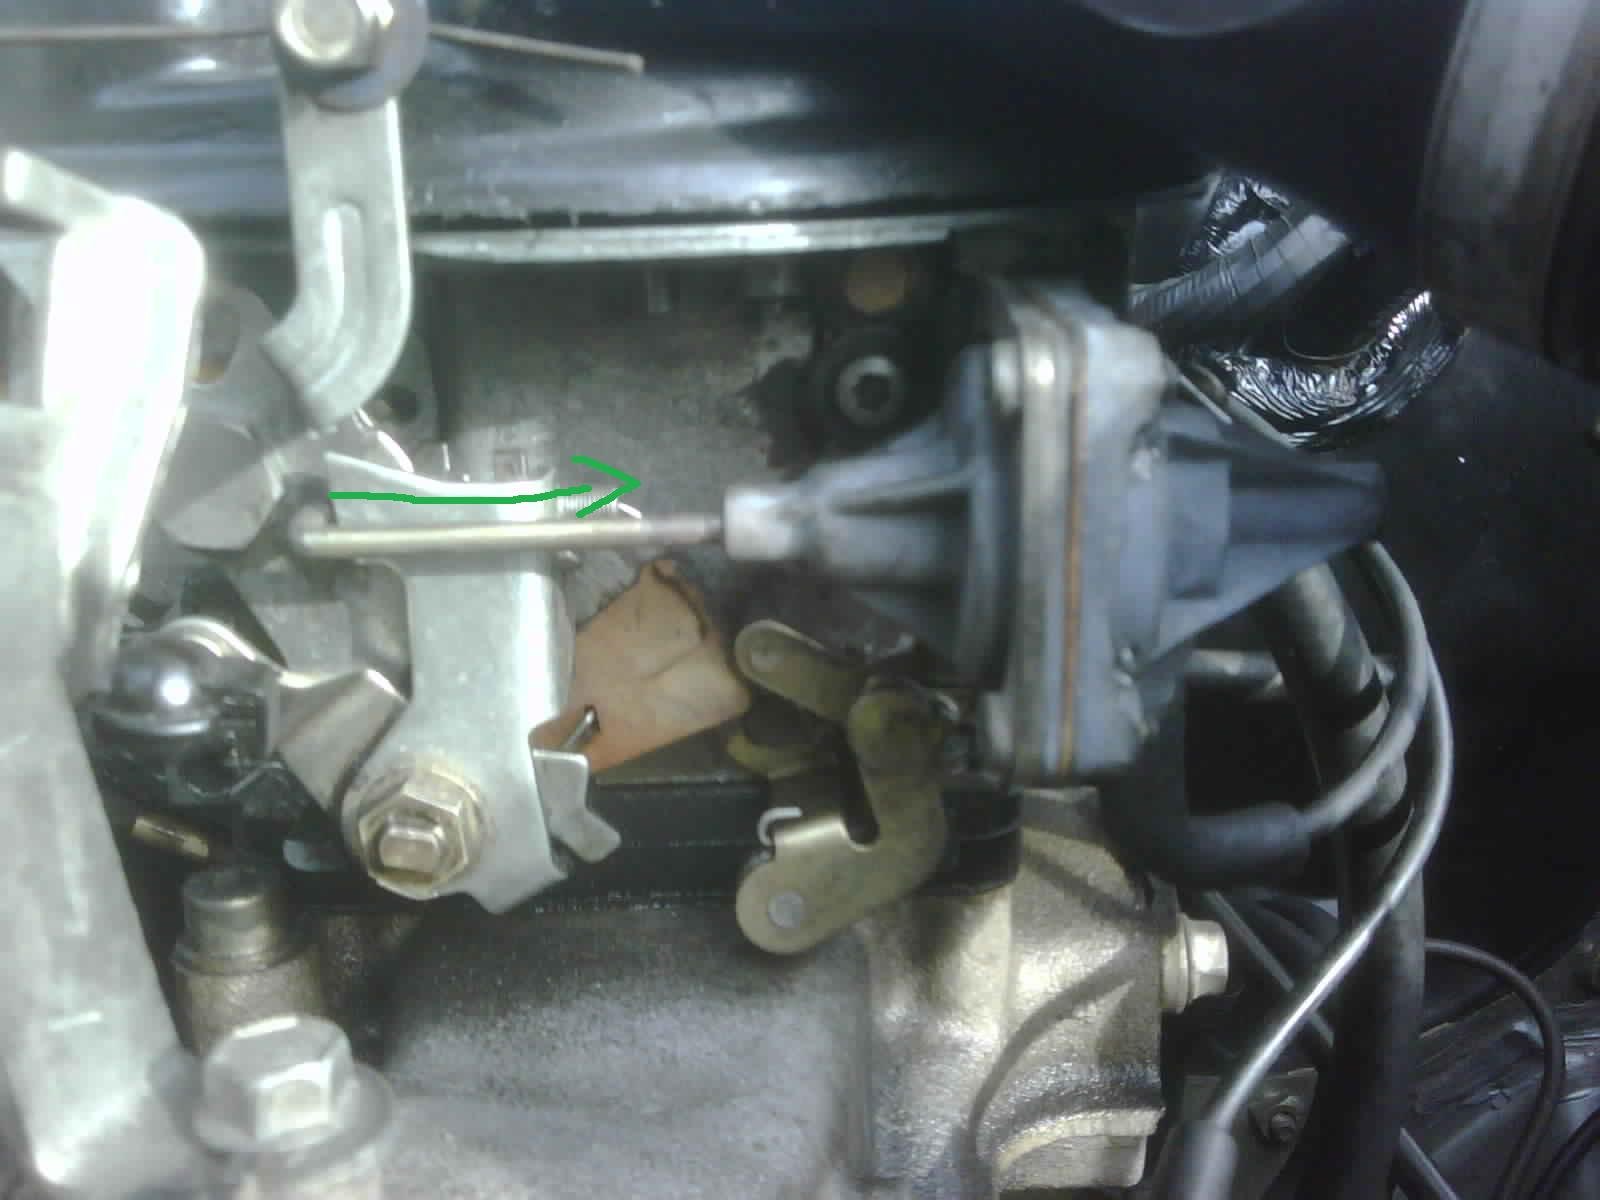 volvo 240 live solex cisac idle air compensation rh vol240 blogspot com